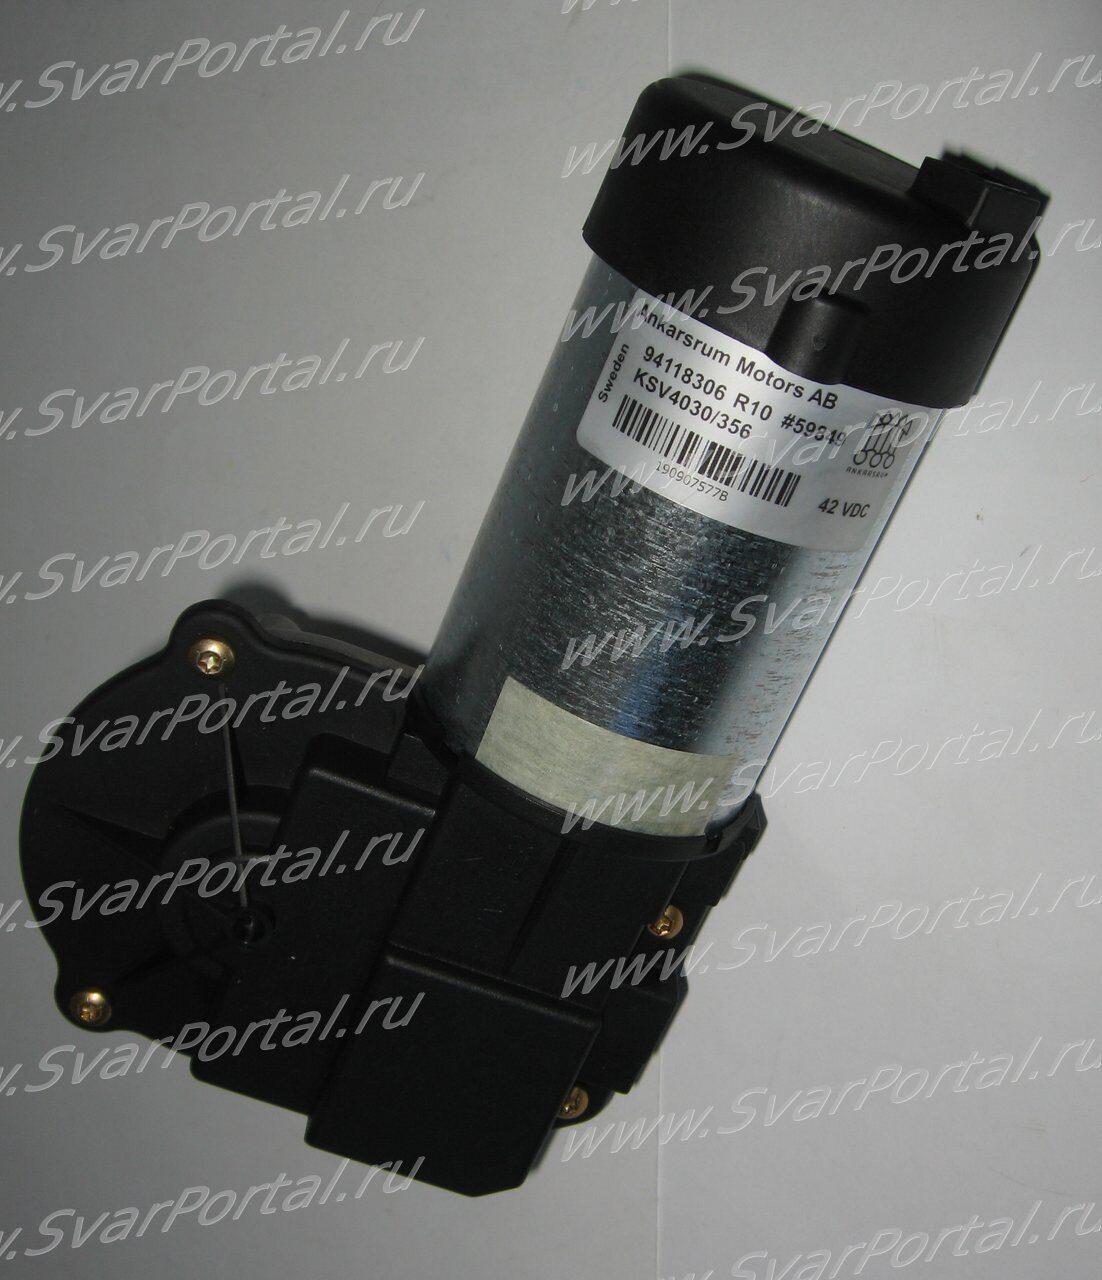 Transmissive 5V Yellow on Black 20 x 4 English//Japanese Parallel MIDAS MC42005A12W-VNMLY Alphanumeric LCD